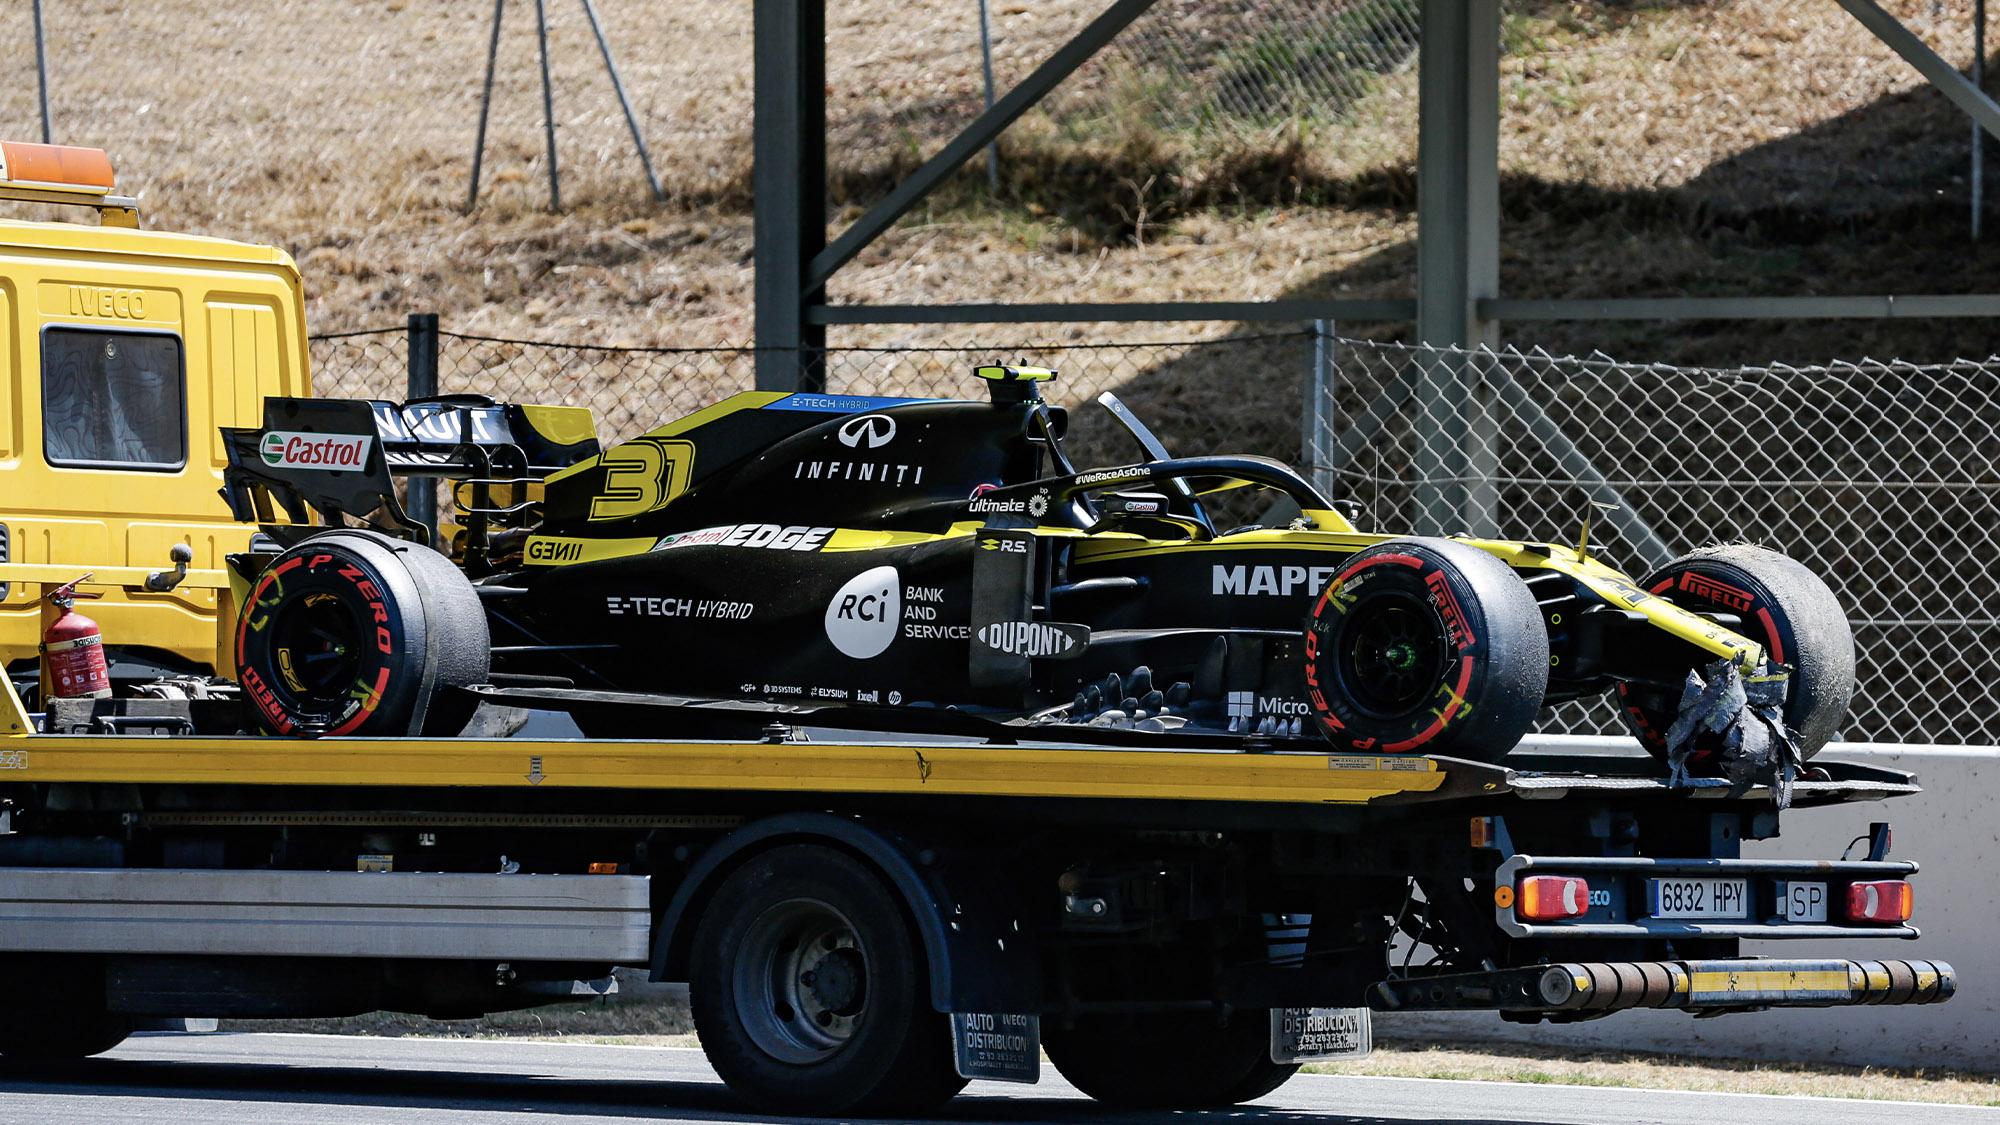 Esteban Ocon's damaged renault after a crash during practice for the 2012 Spanish Grand Prix